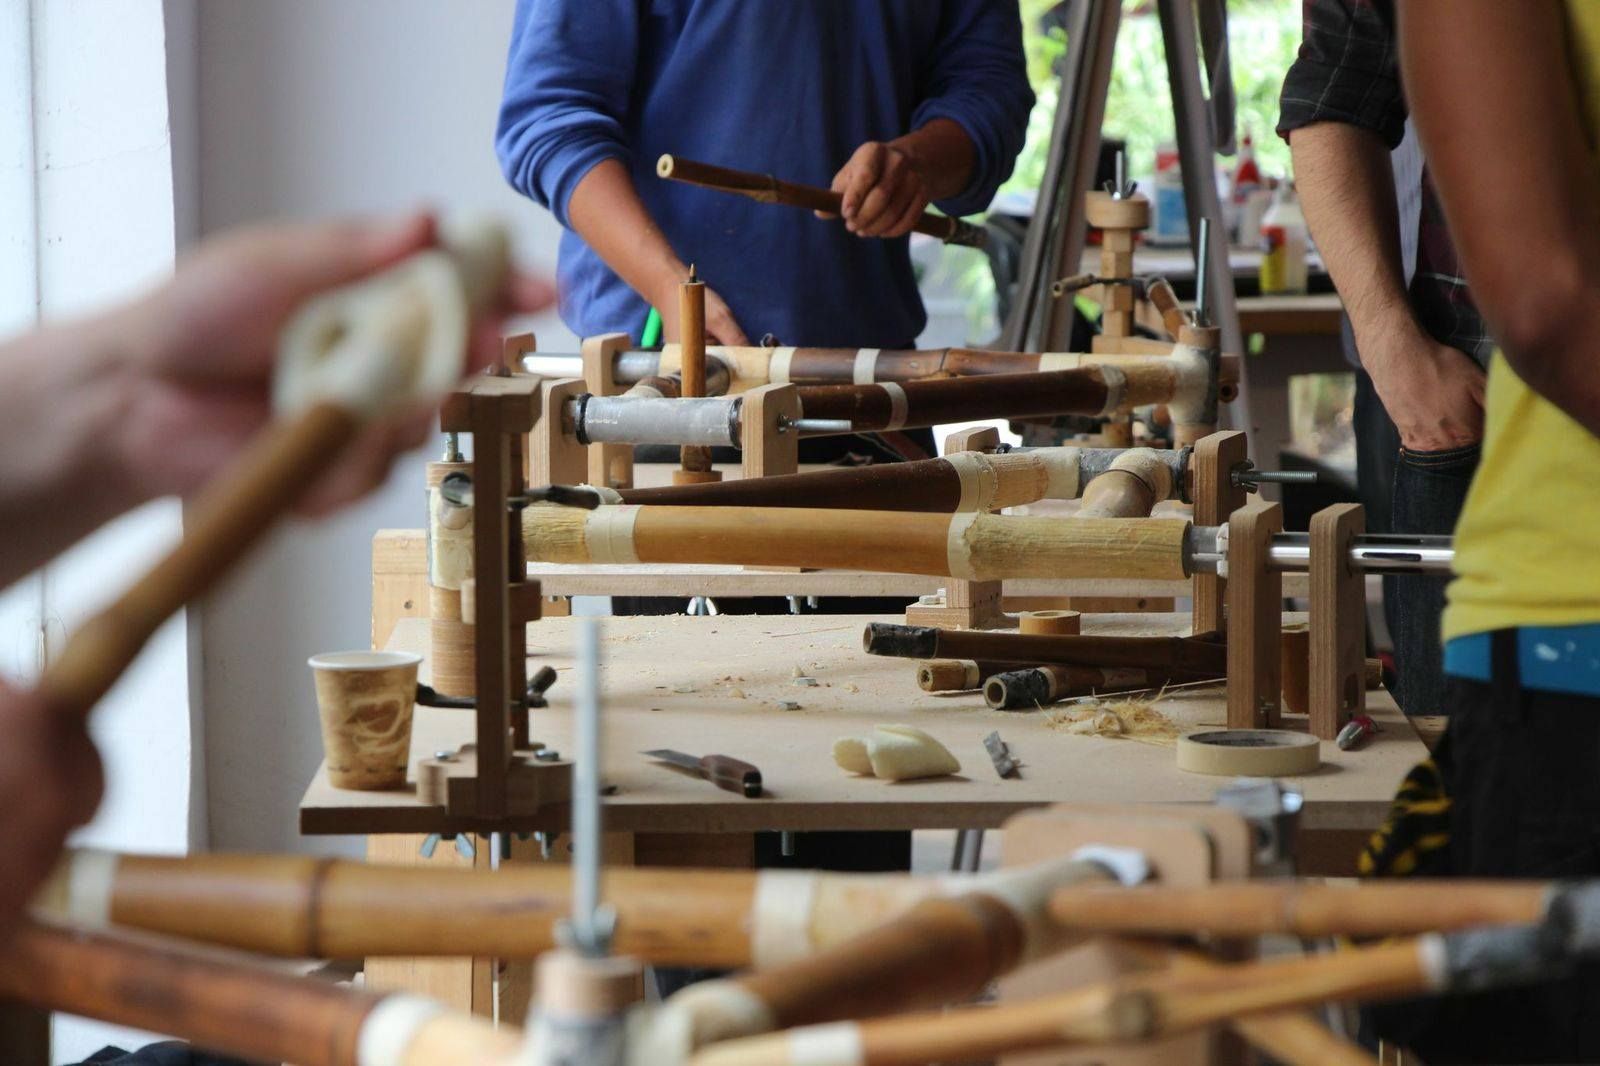 Fahrradwerkstatt der mexikanischen Fahrradmanufaktur Bamboocycles